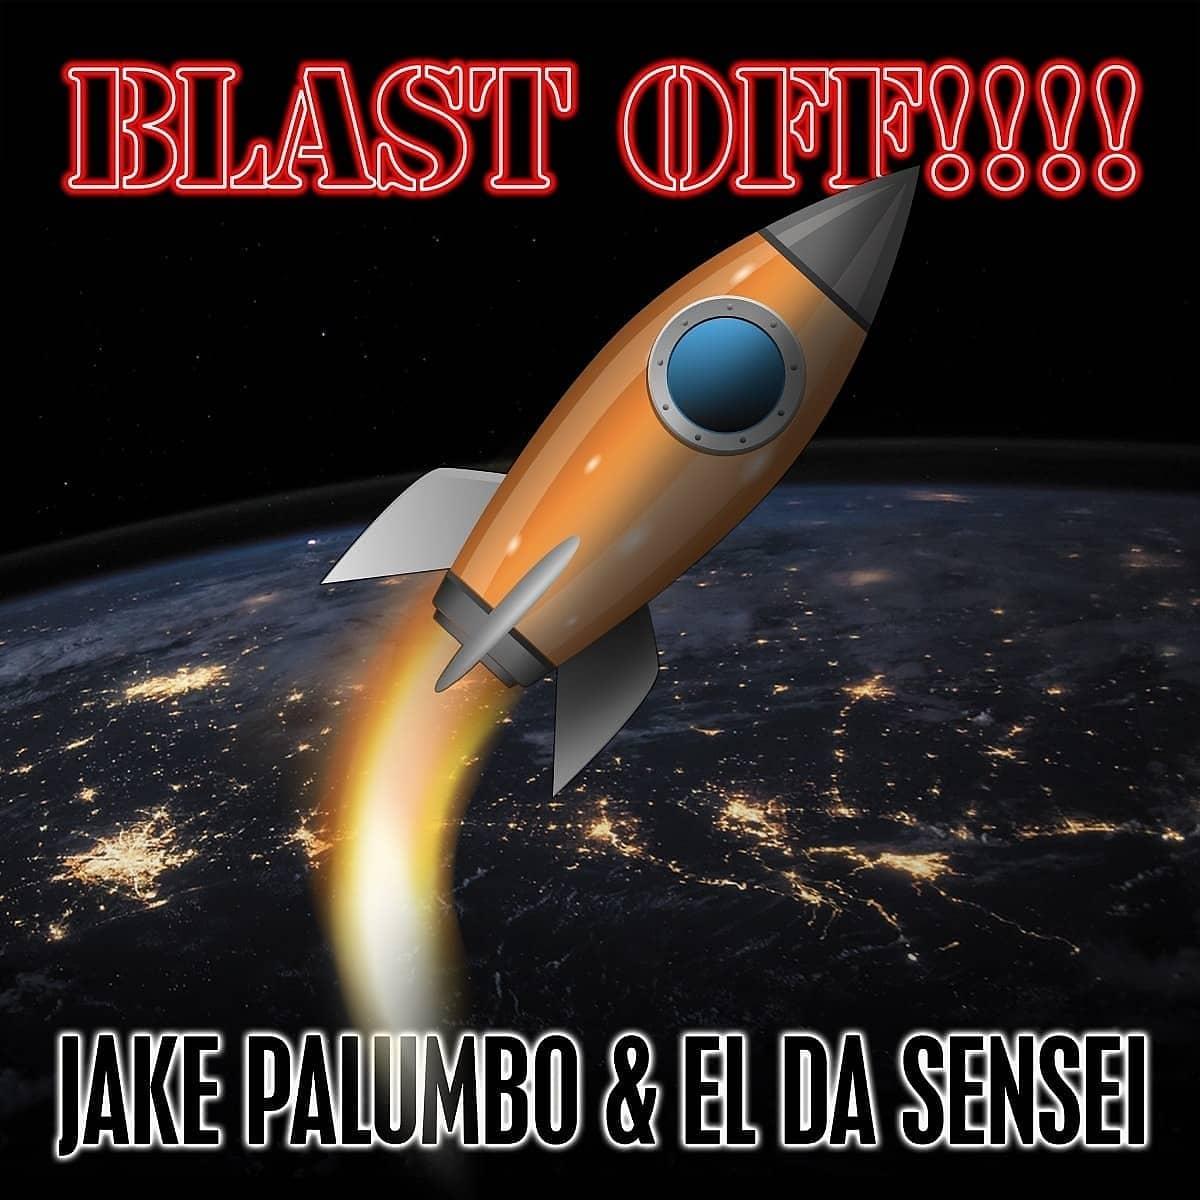 Jake Palumbo & El Da Sensei - Blast Off!!!